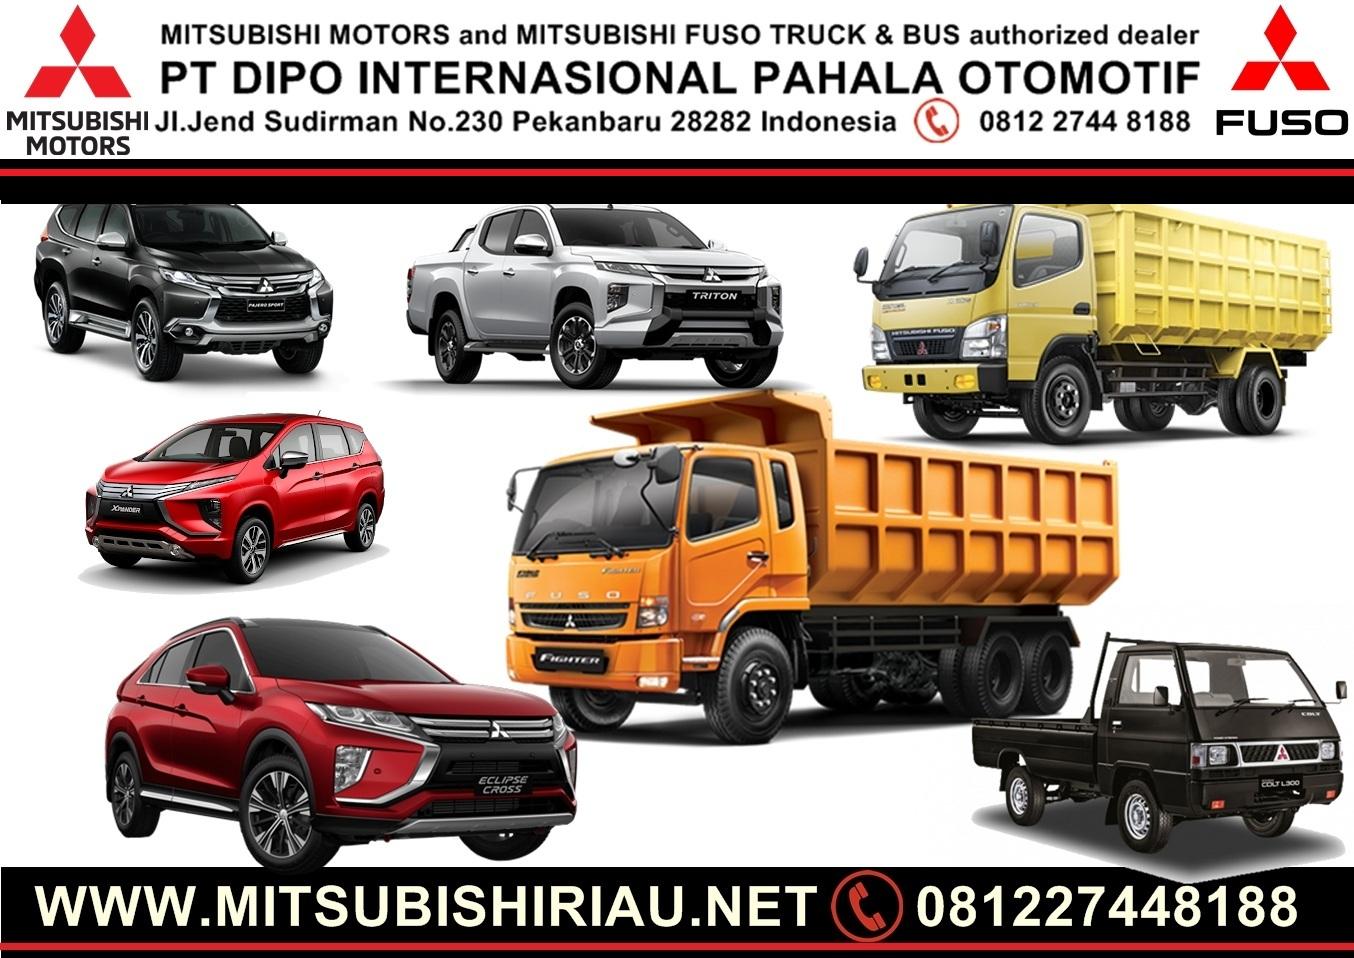 Harga Kredit Mitsubishi Pekanbaru Riau Oktober 2019